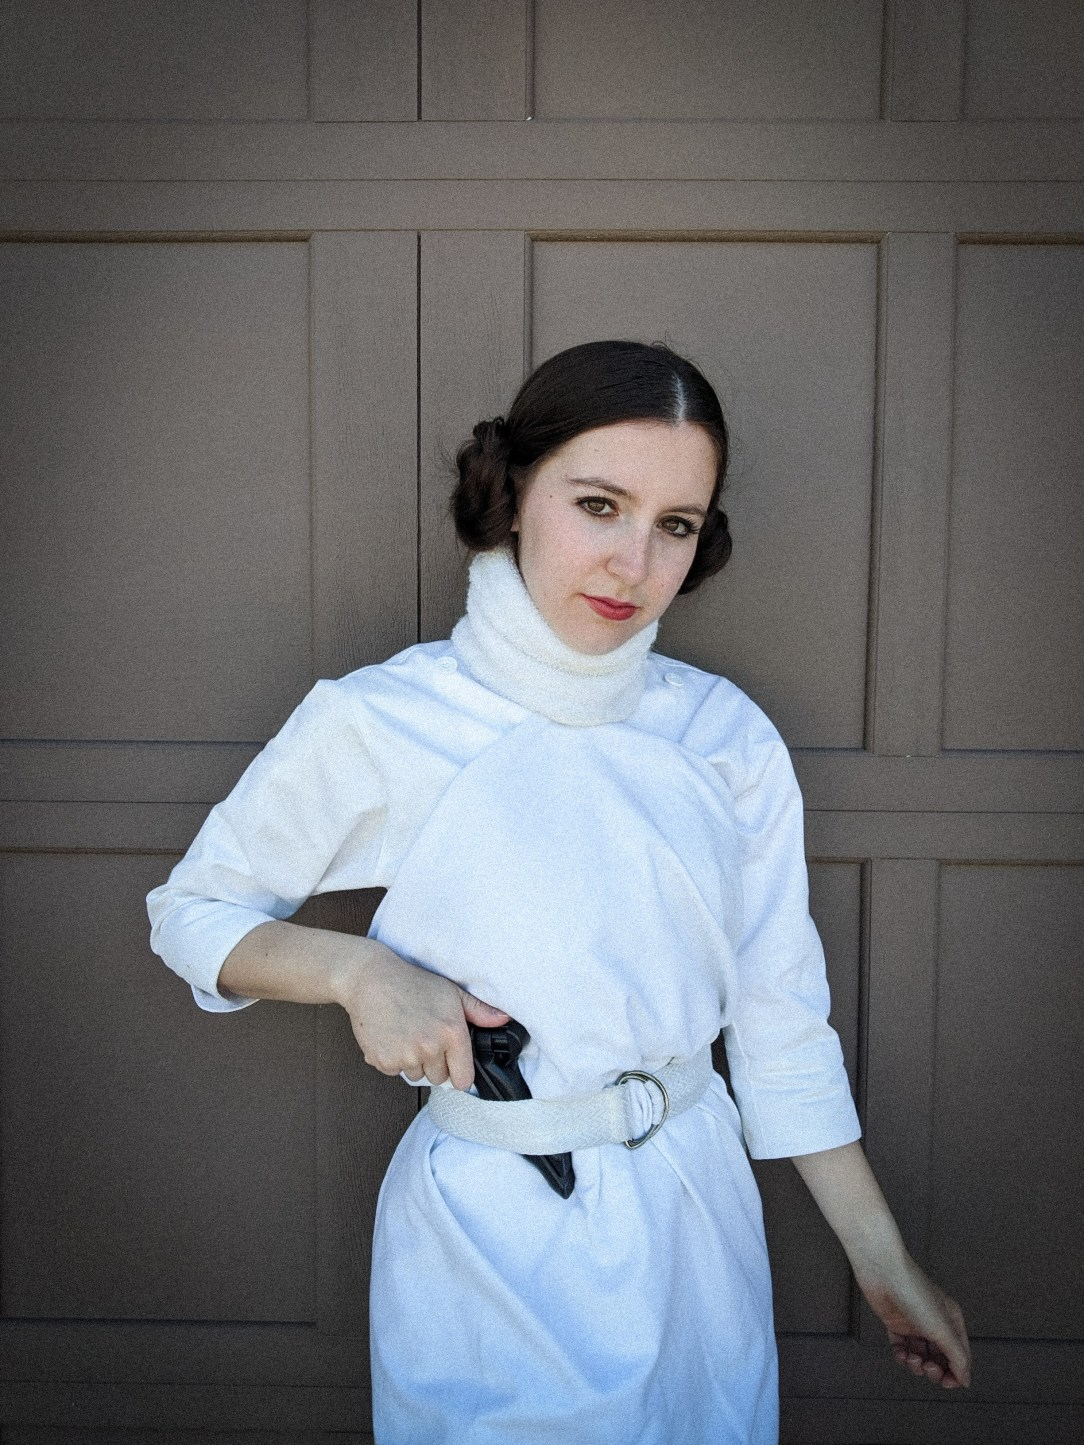 Princess Leia, Carrie Fisher, Princess Leia costume